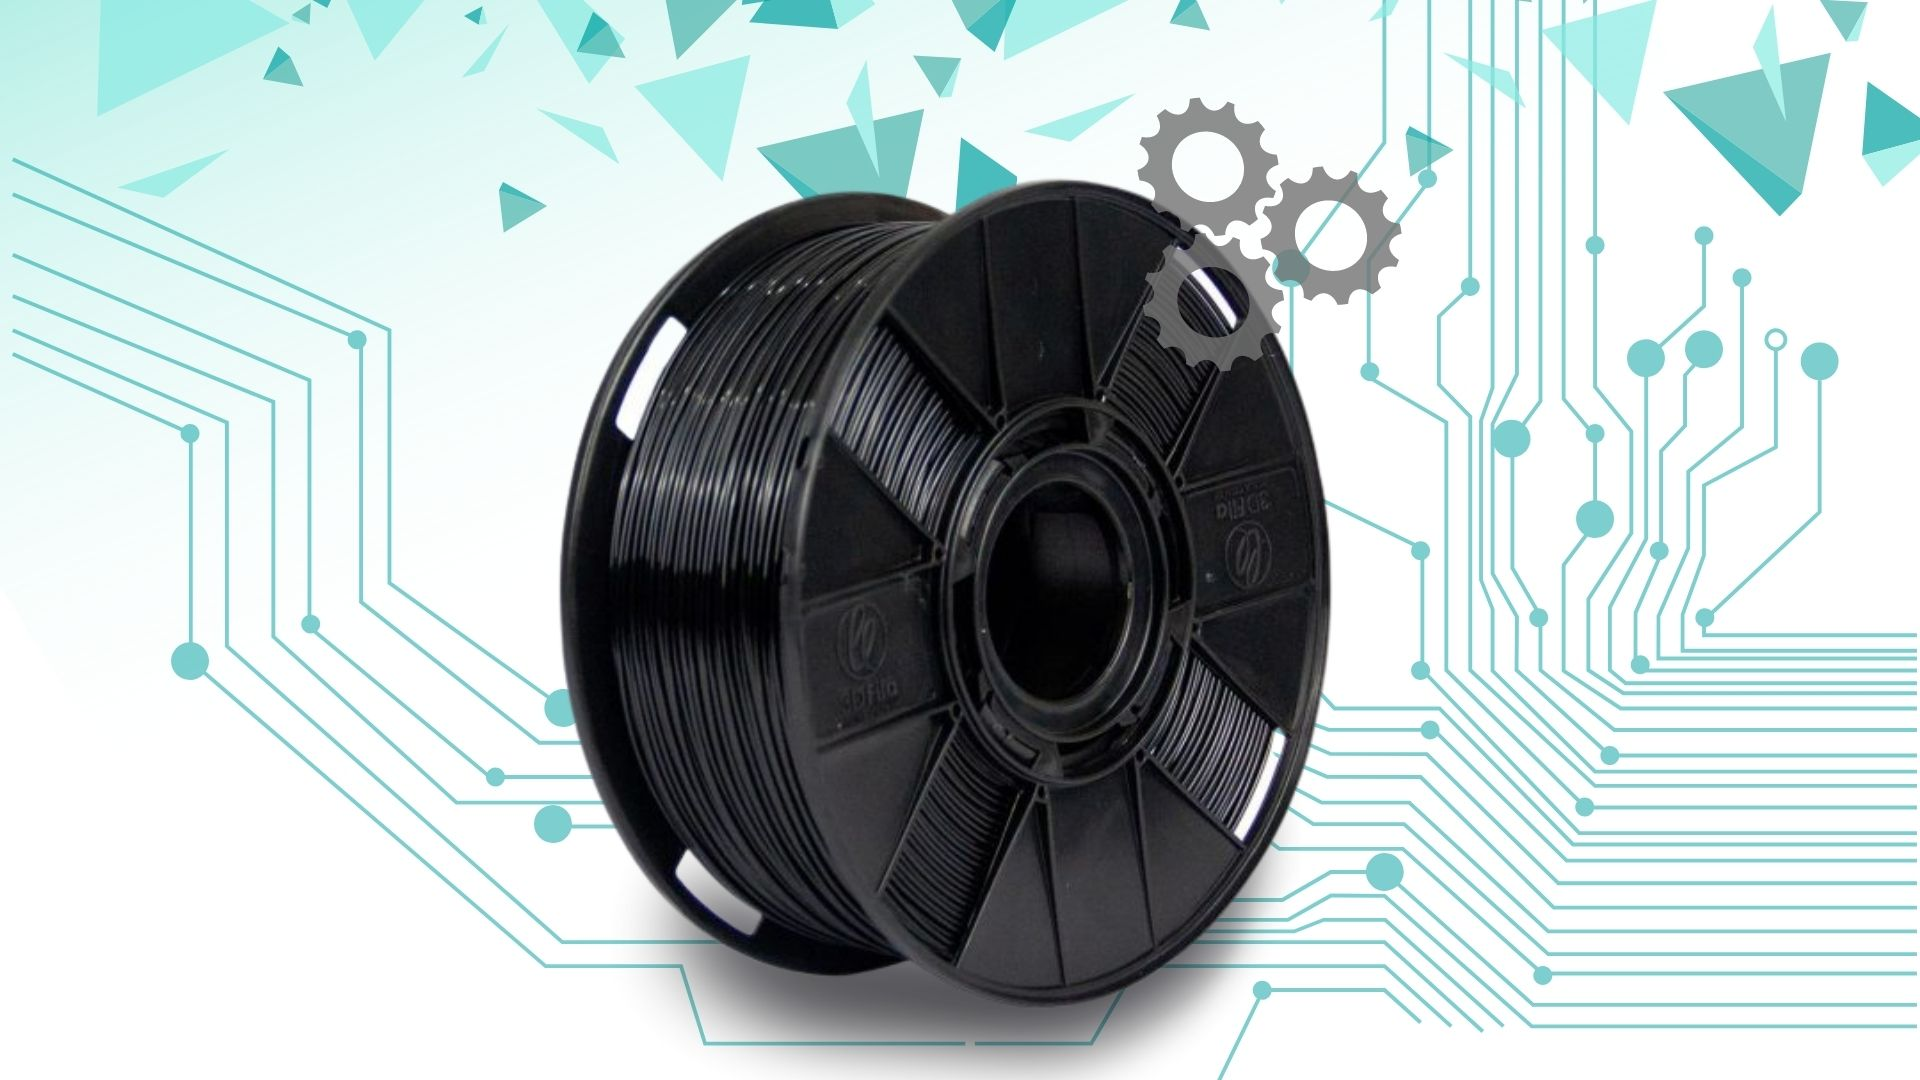 Foto de capa referente ao filamento Tritan